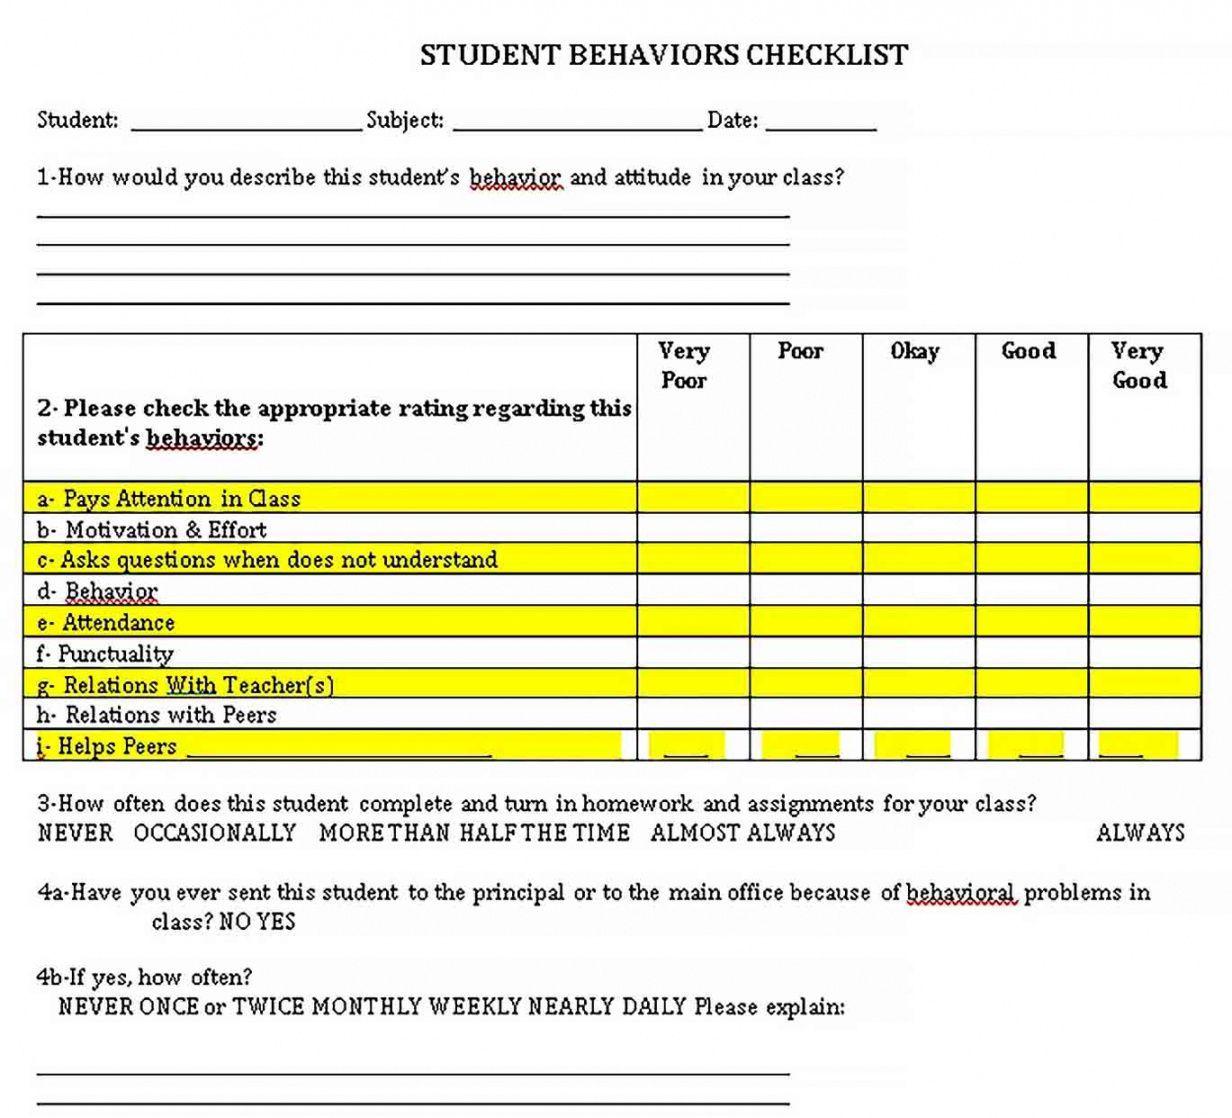 Get Our Sample Of Student Behavior Checklist Template For Free Student Behavior Checklist Template Student